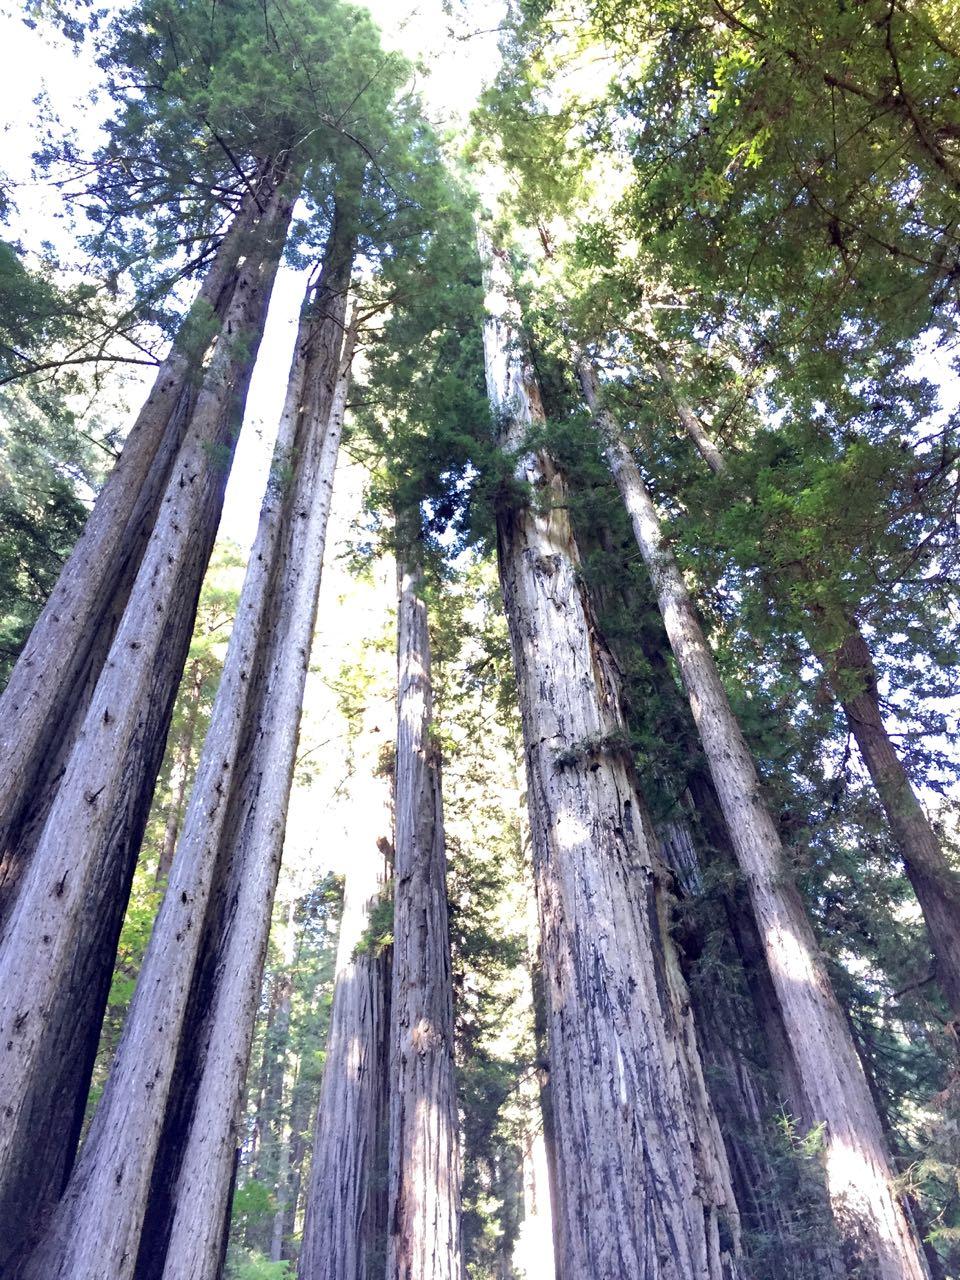 Redwoods 2017 10 01 237 Of 244